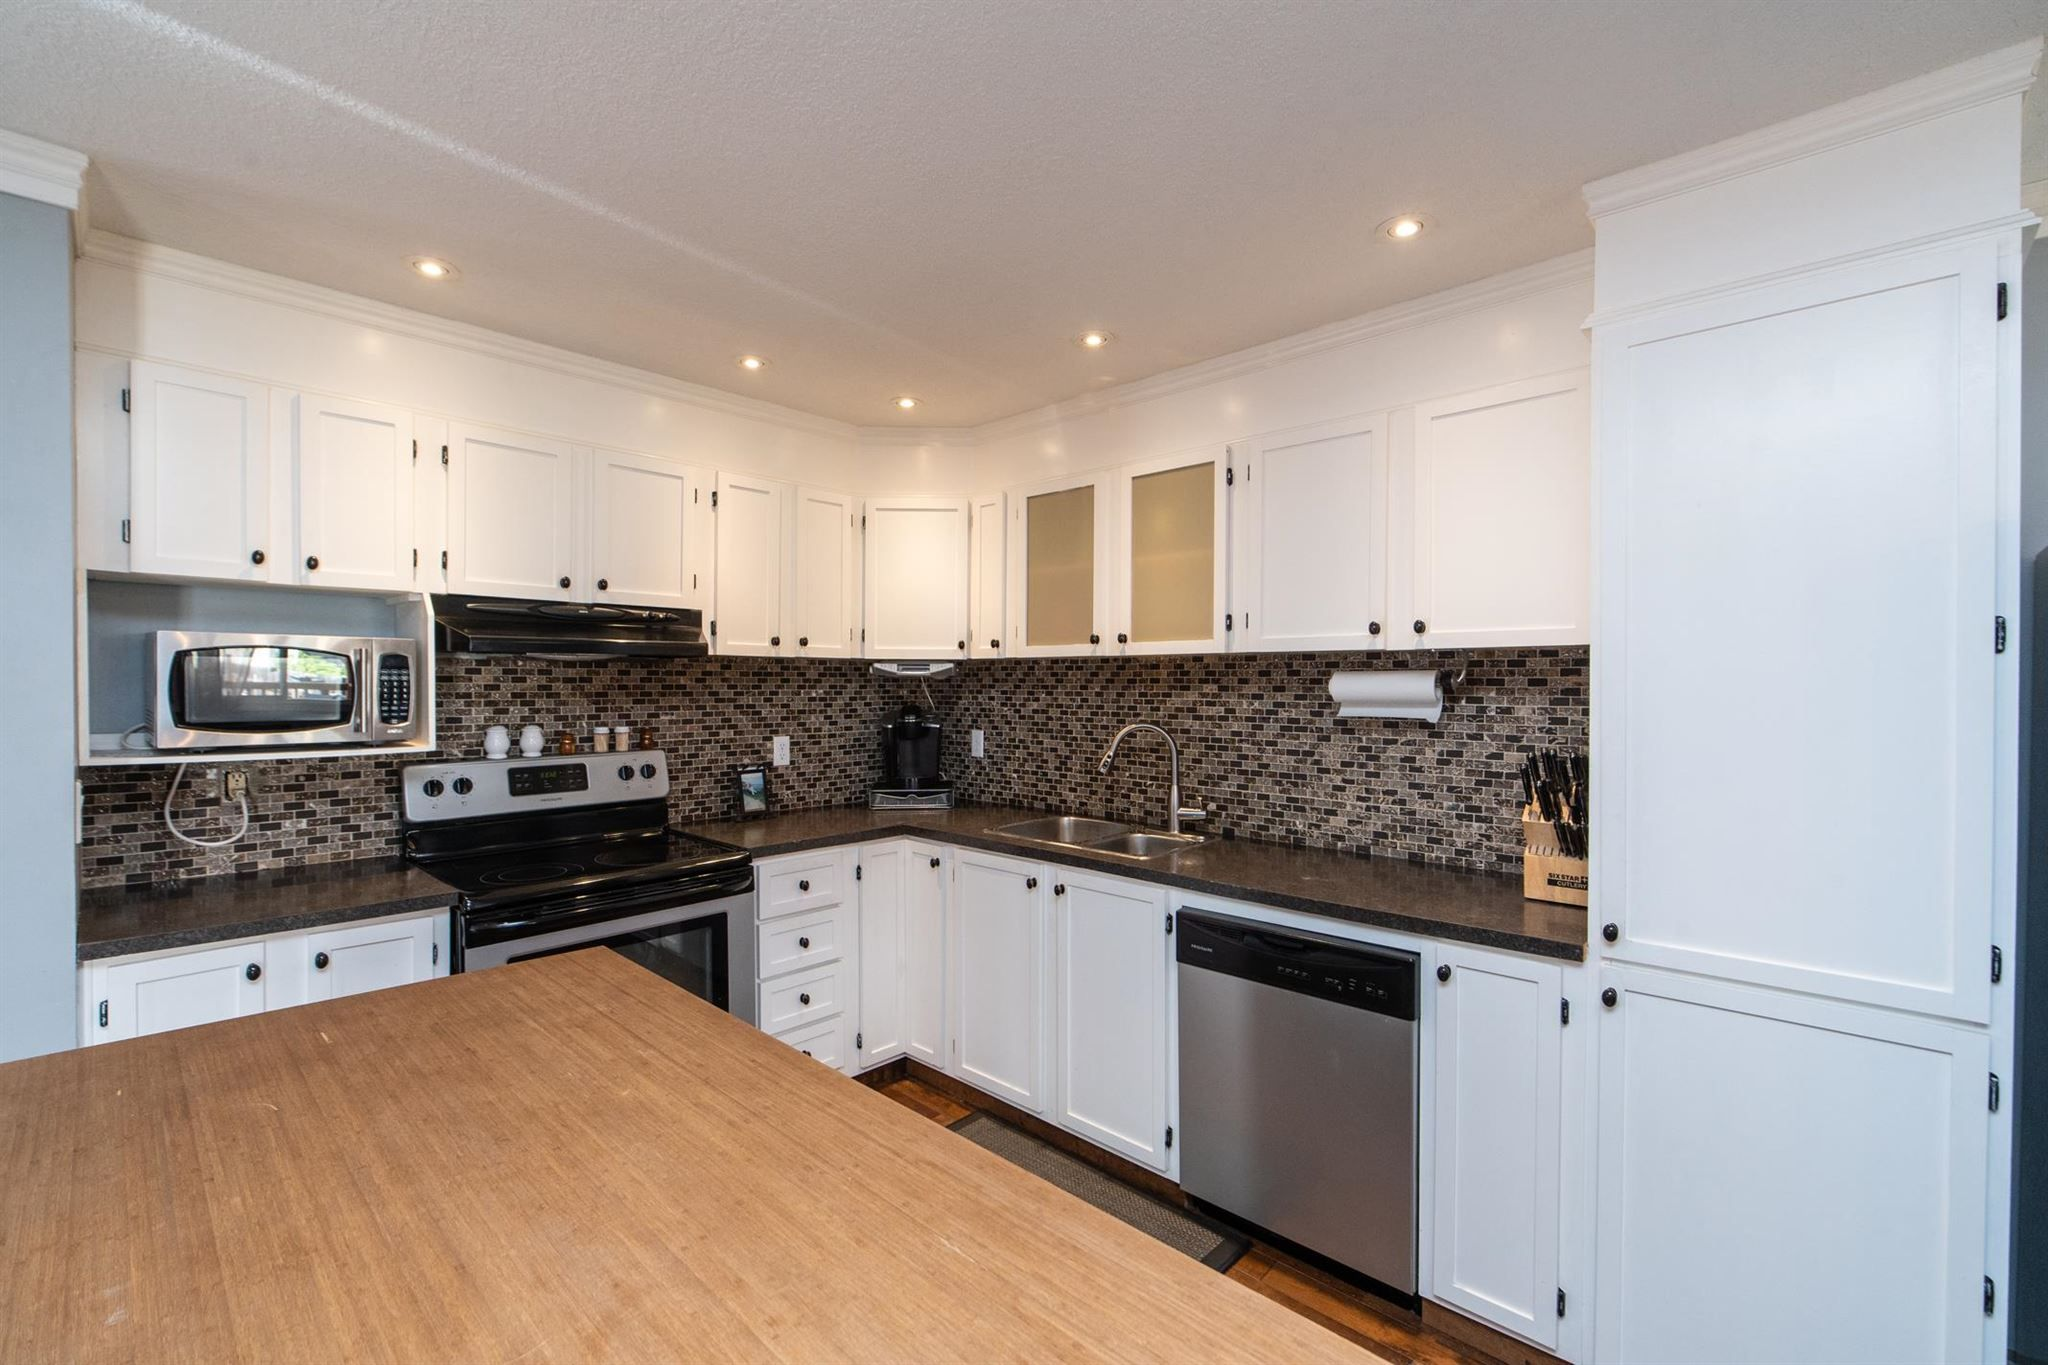 Main Photo: 6 WILSON Drive: Devon House for sale : MLS®# E4251063